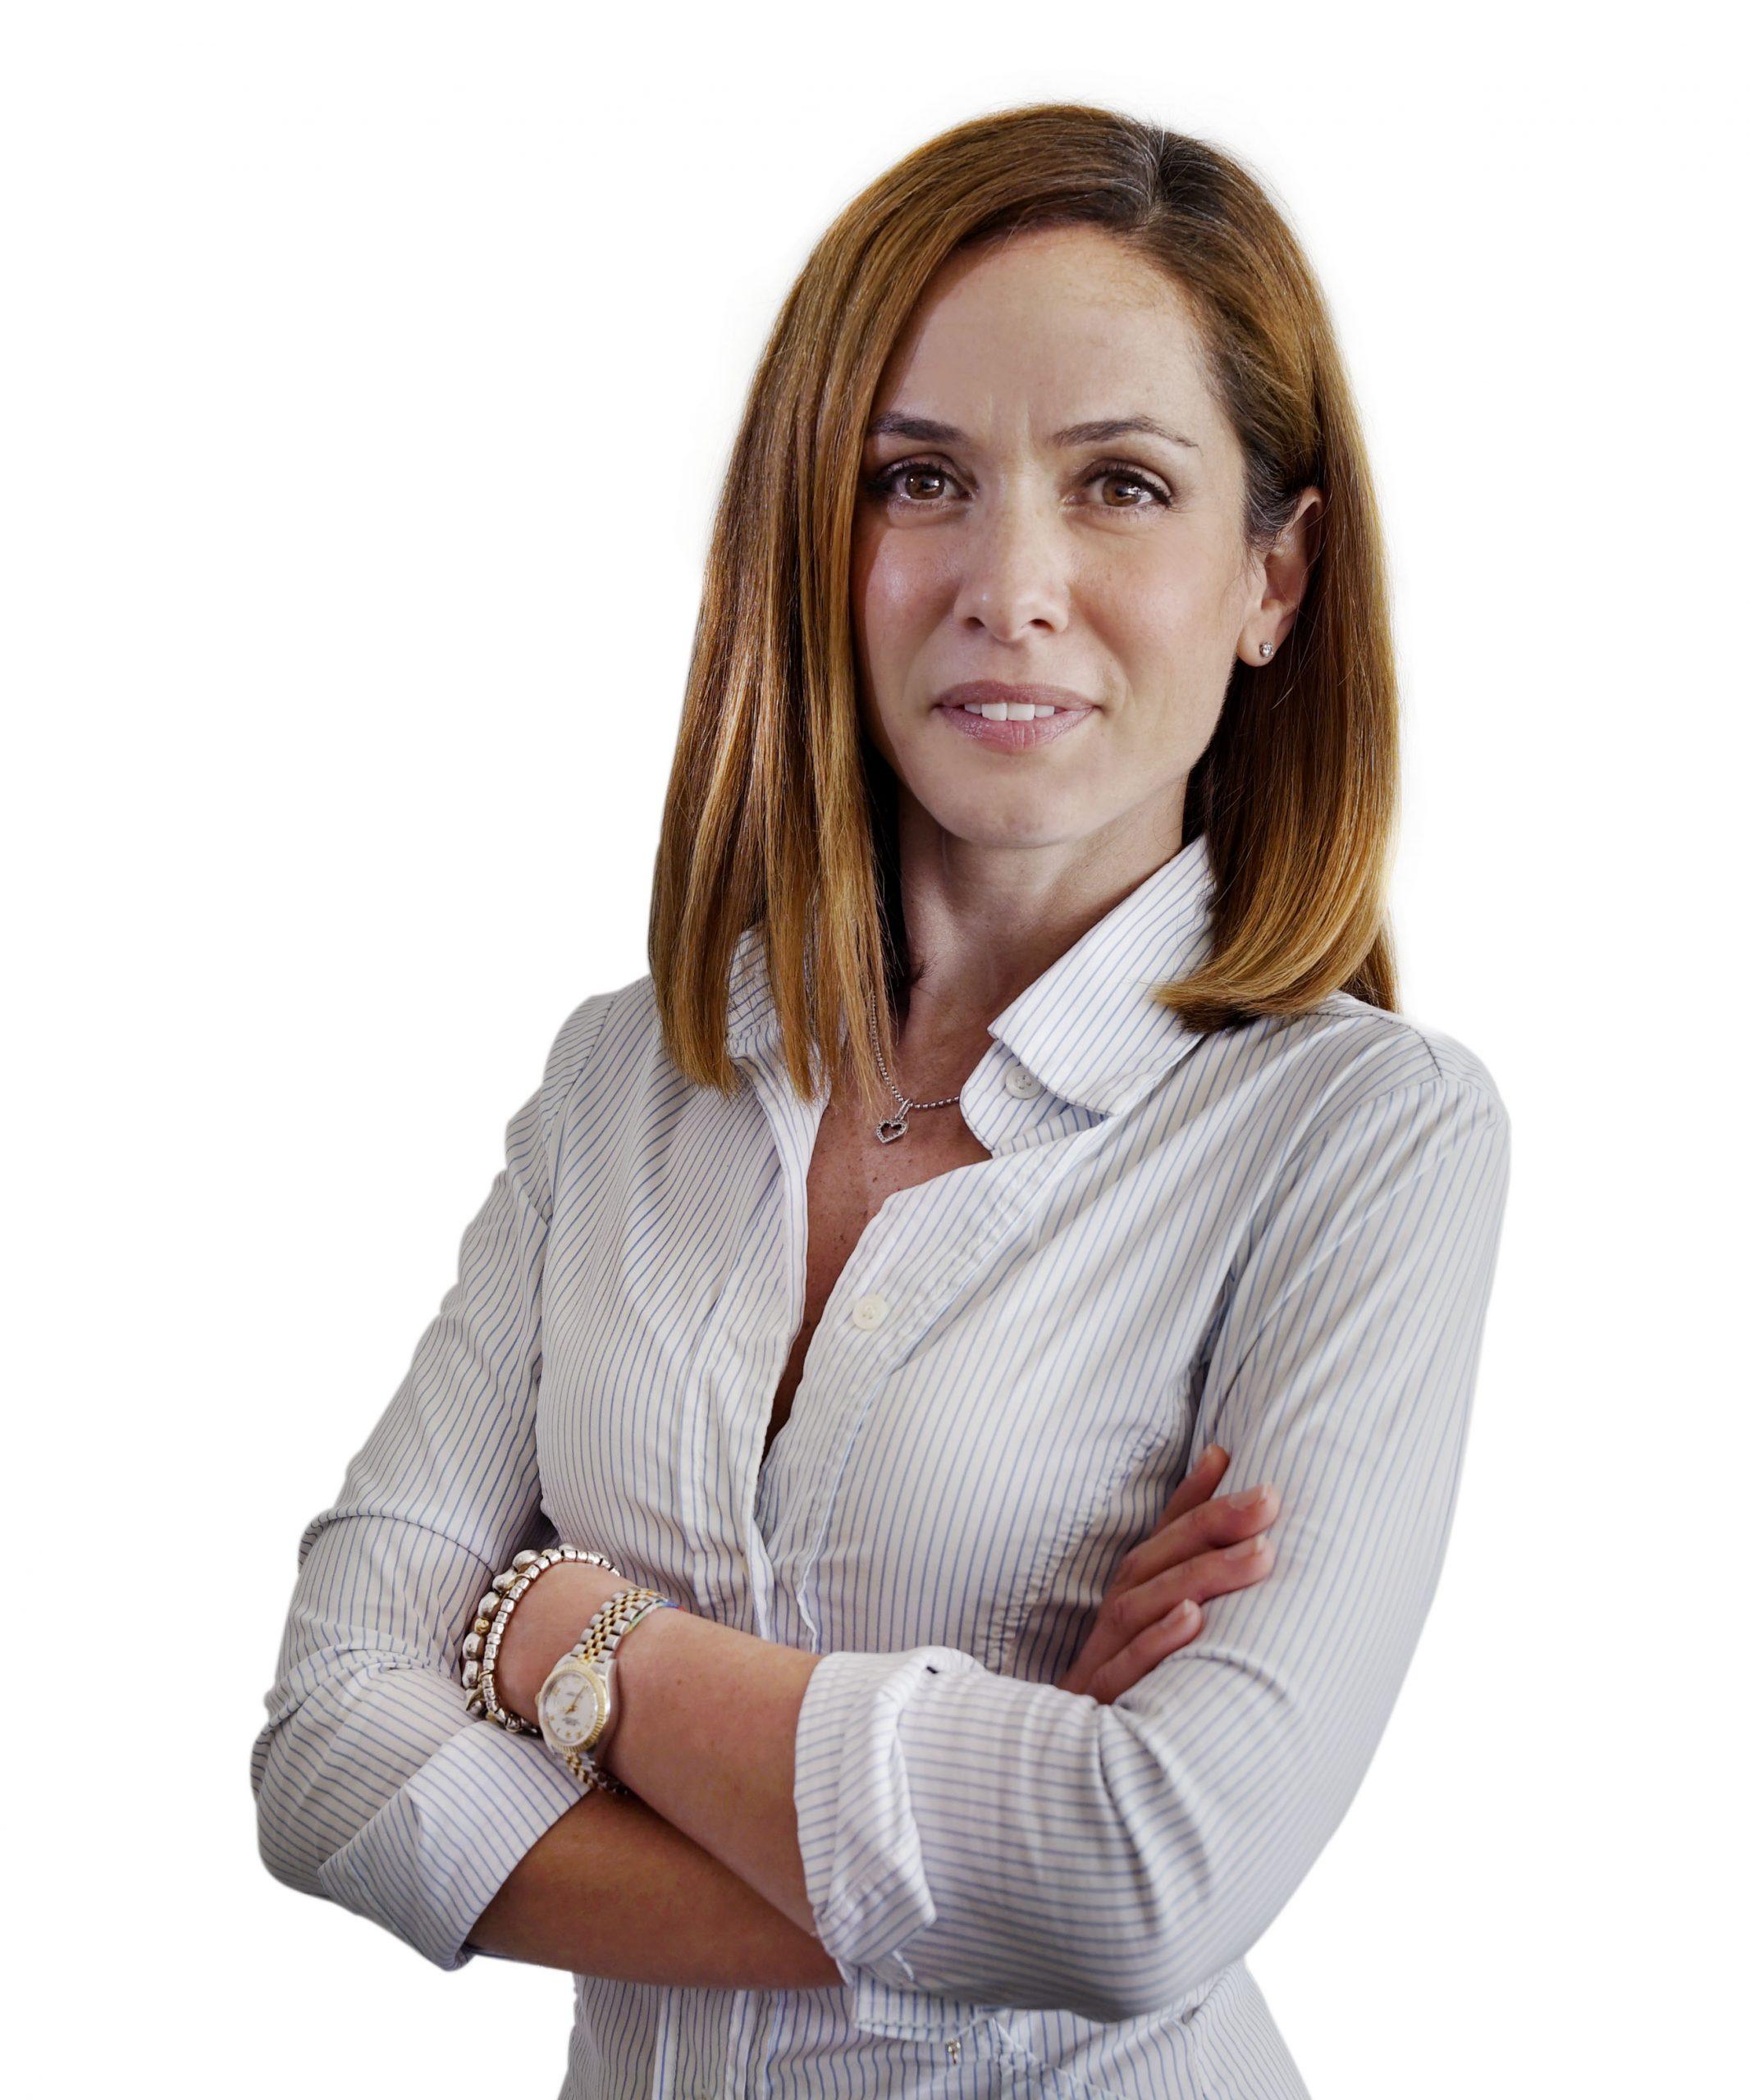 Ing. Eleonora Tomasselli